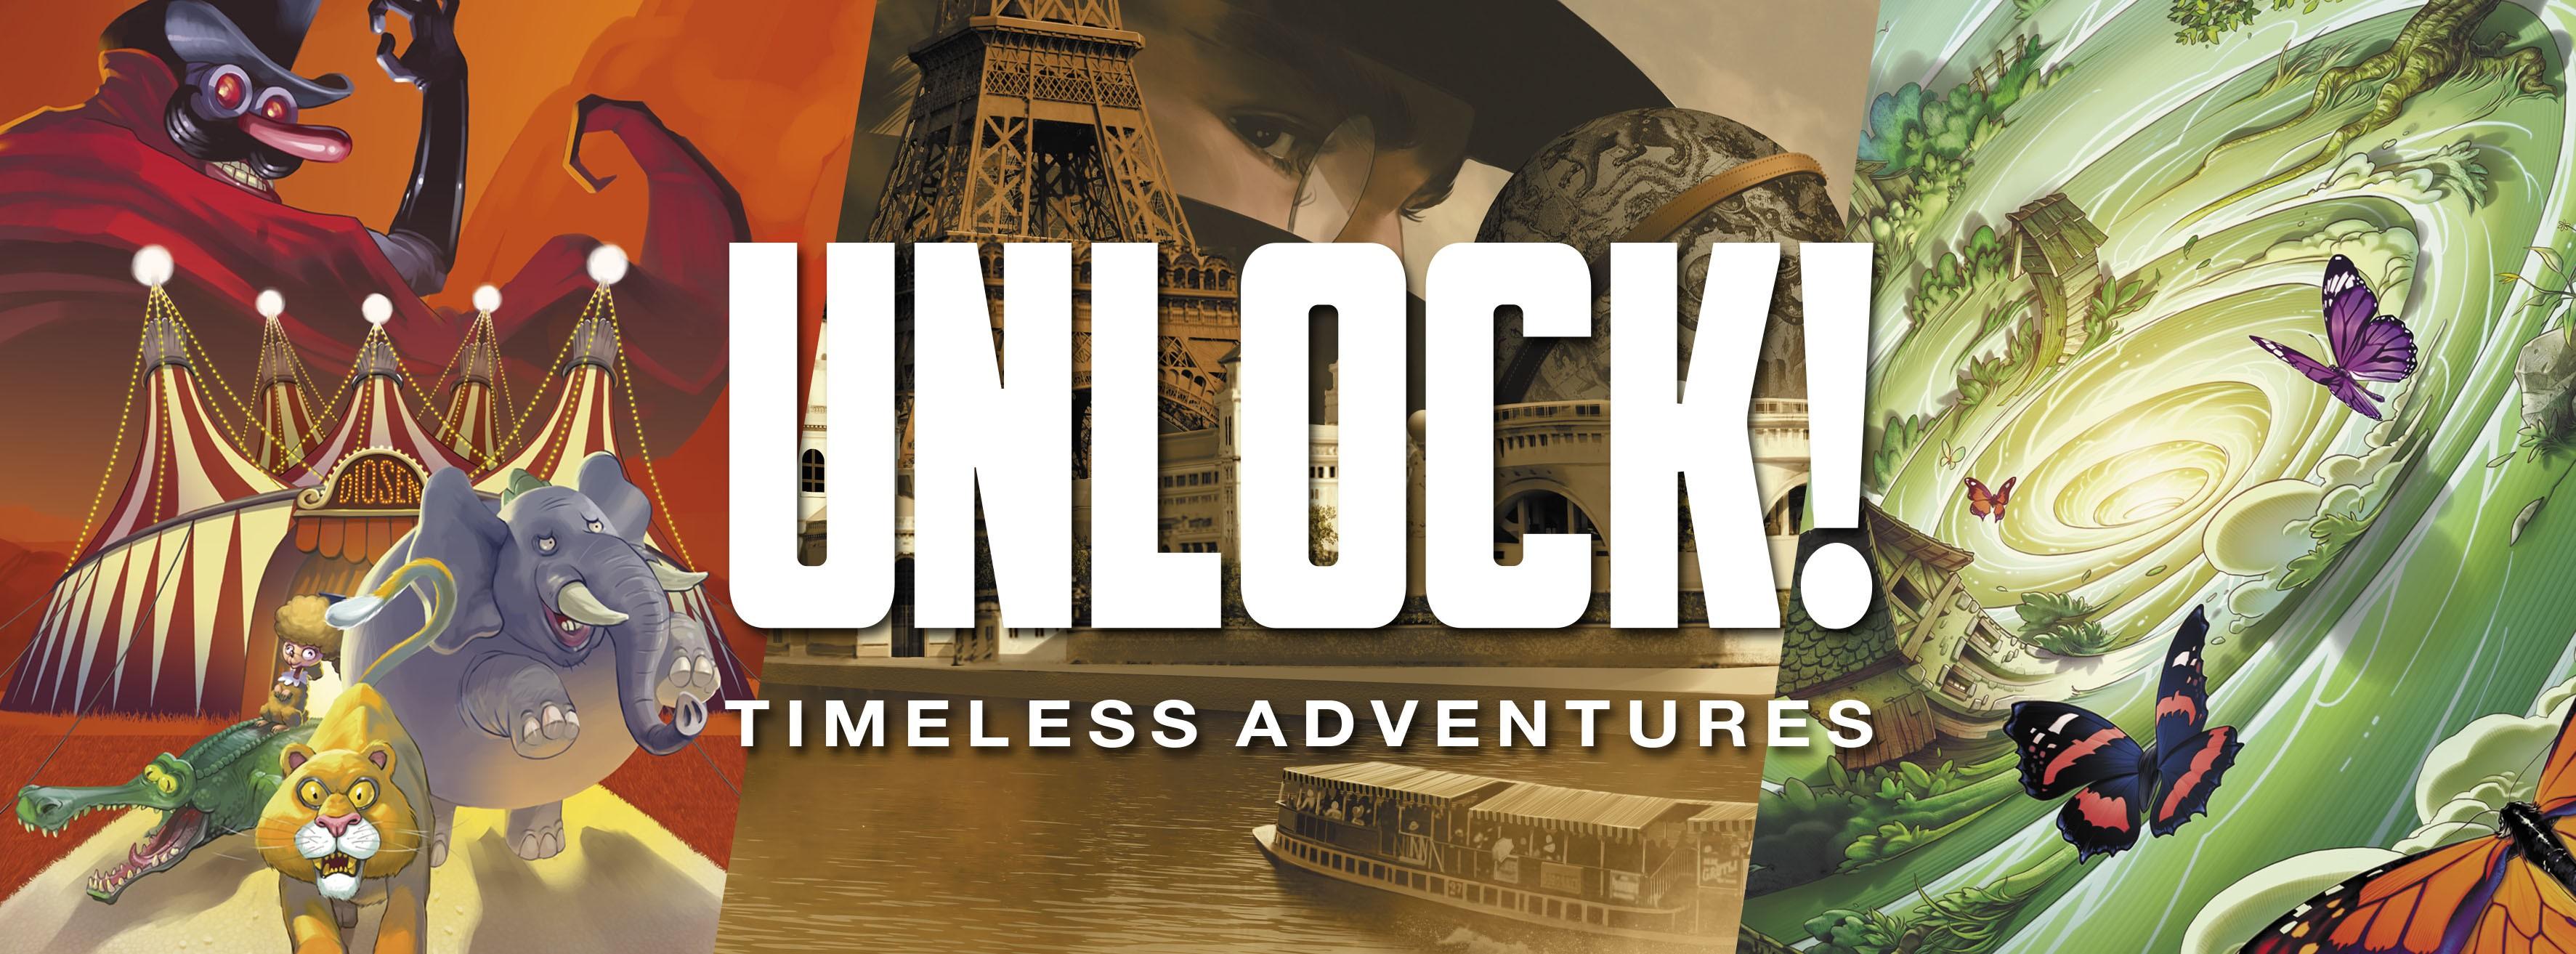 Unlock : Timeless Adventures